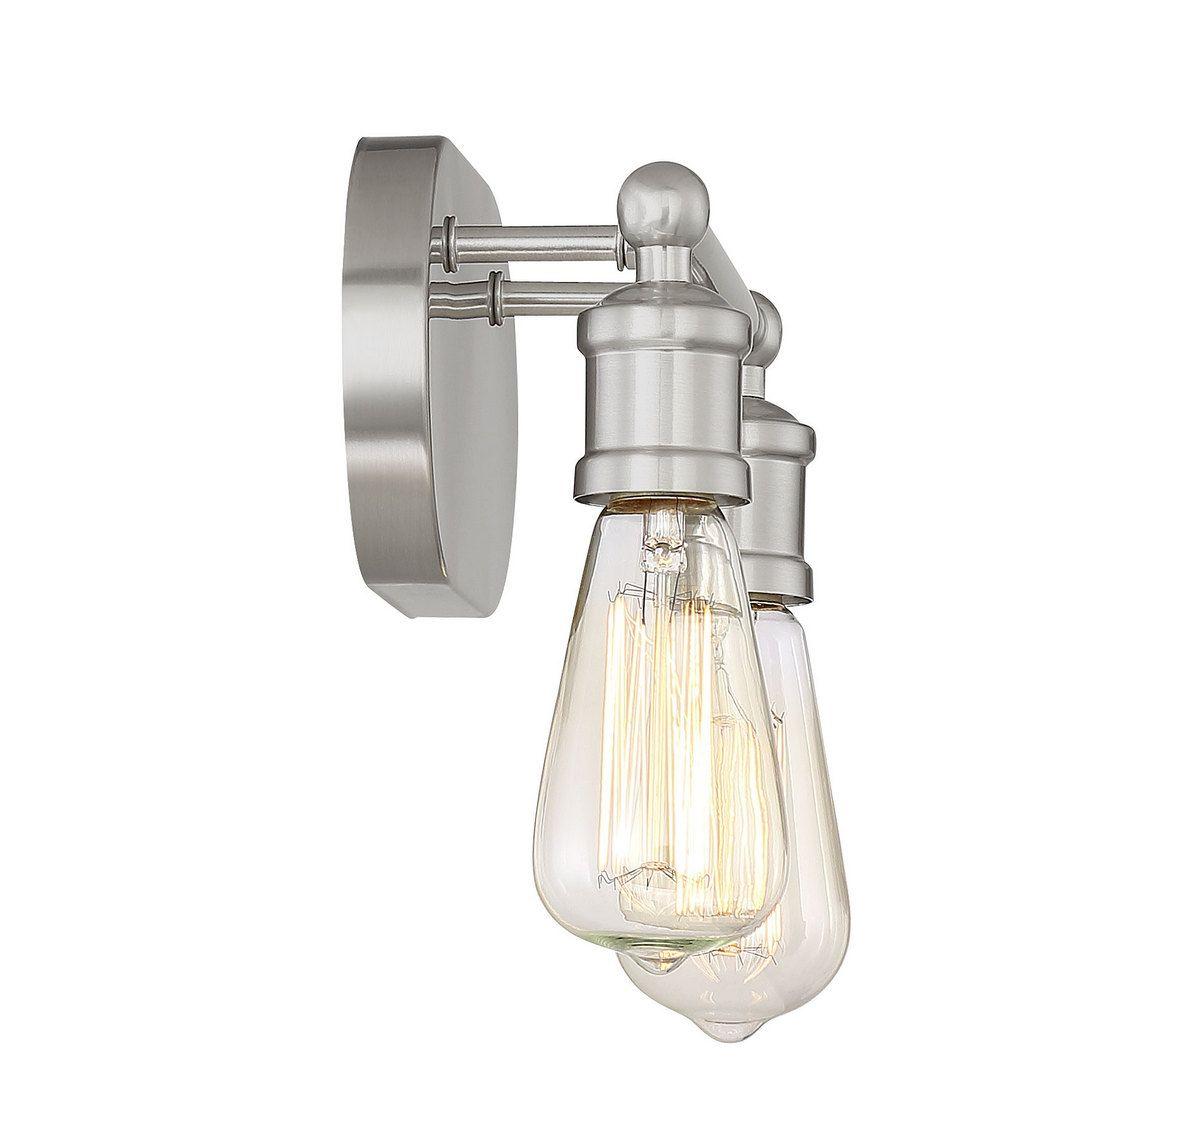 Trade Winds Lighting Industrial Small Bathroom Vanity